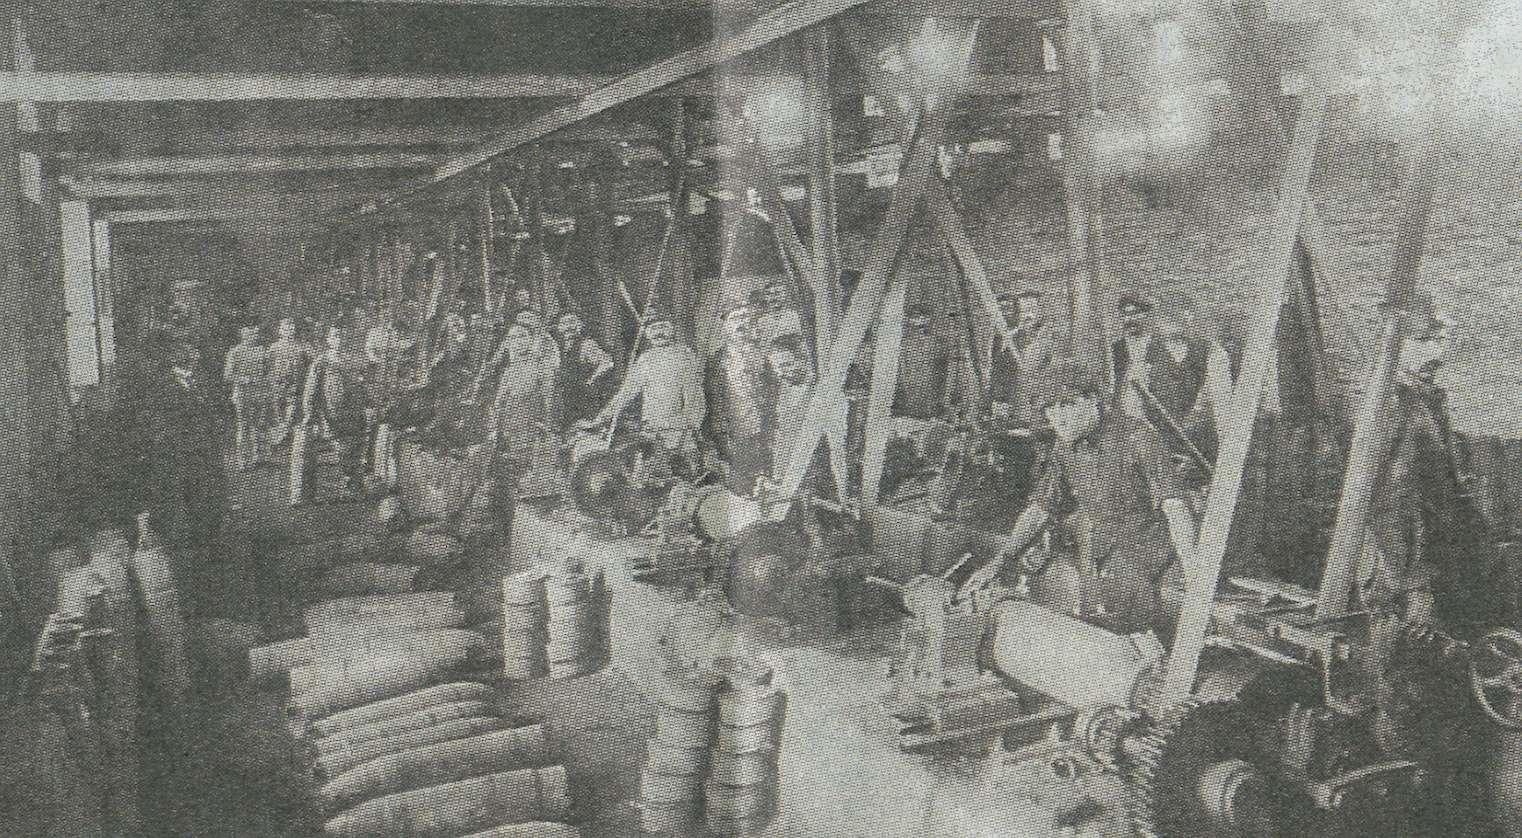 Produzione di armamenti nella Fabbrica Calzoni, 1942-45